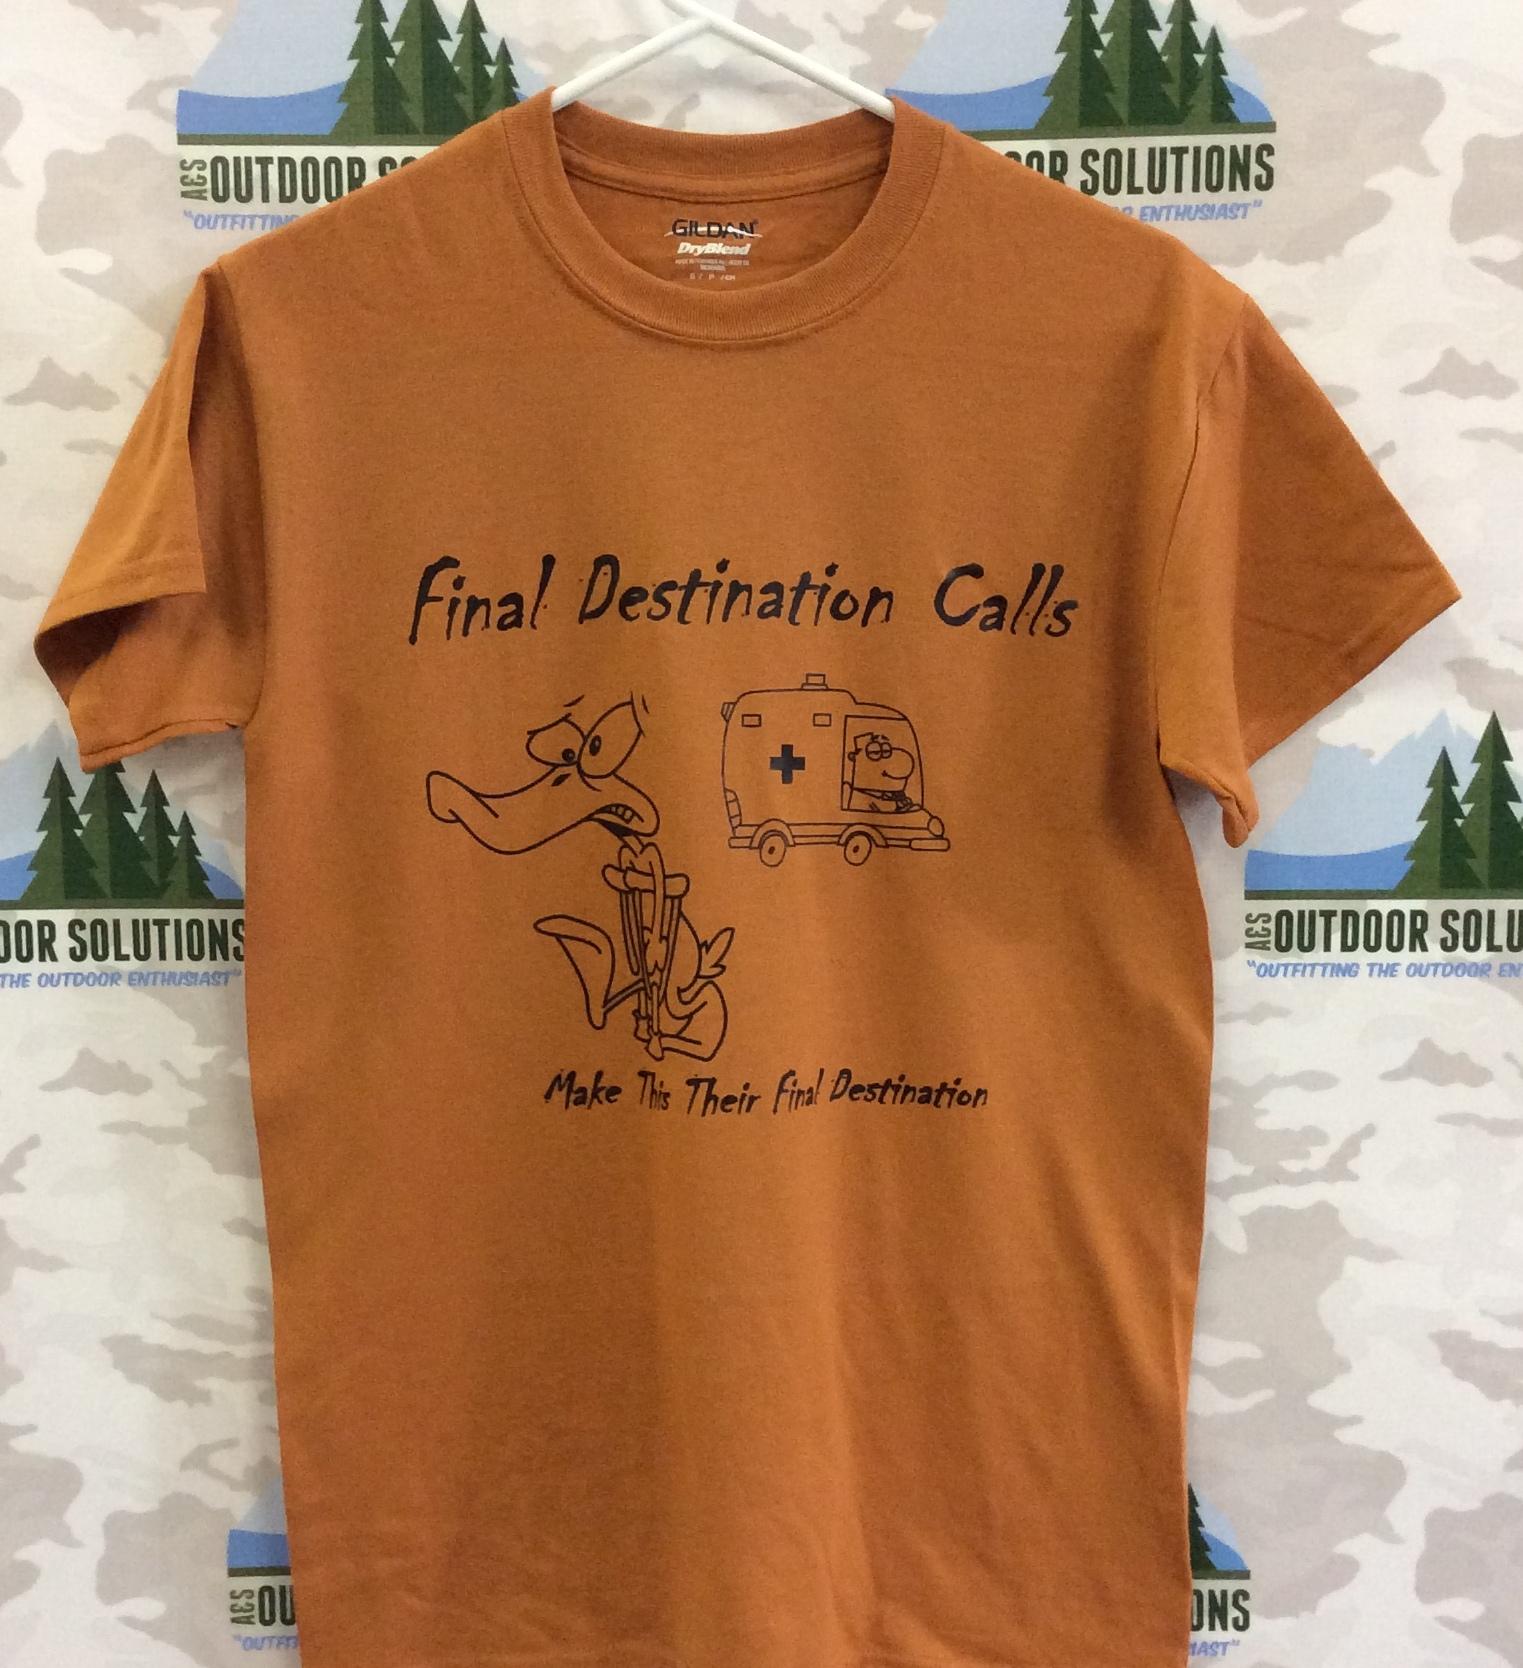 Texas Orange Tee with Black Logo from Final Destination Calls